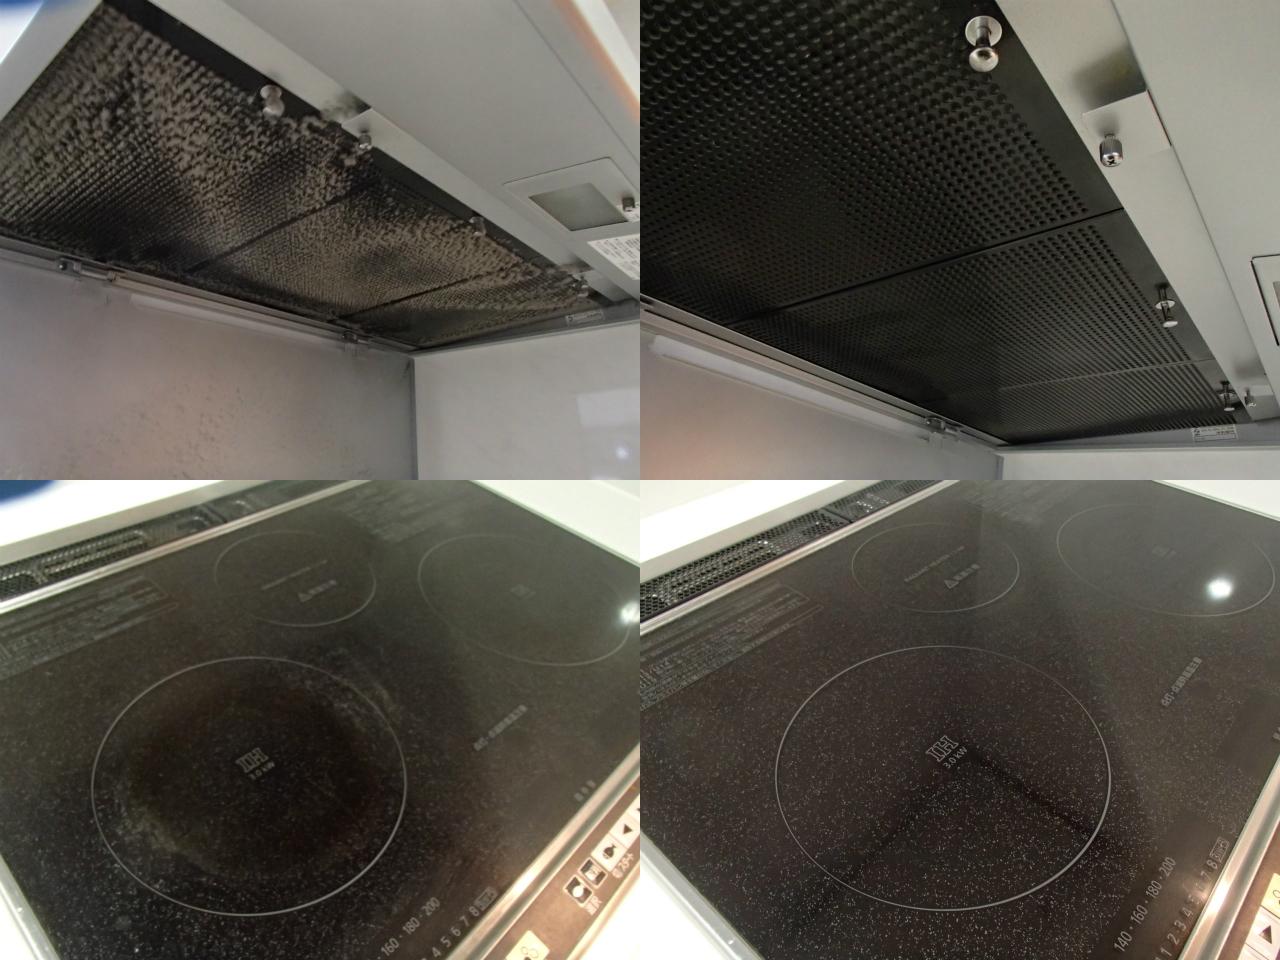 http://ajras.net/images/121228-kitchen.jpg